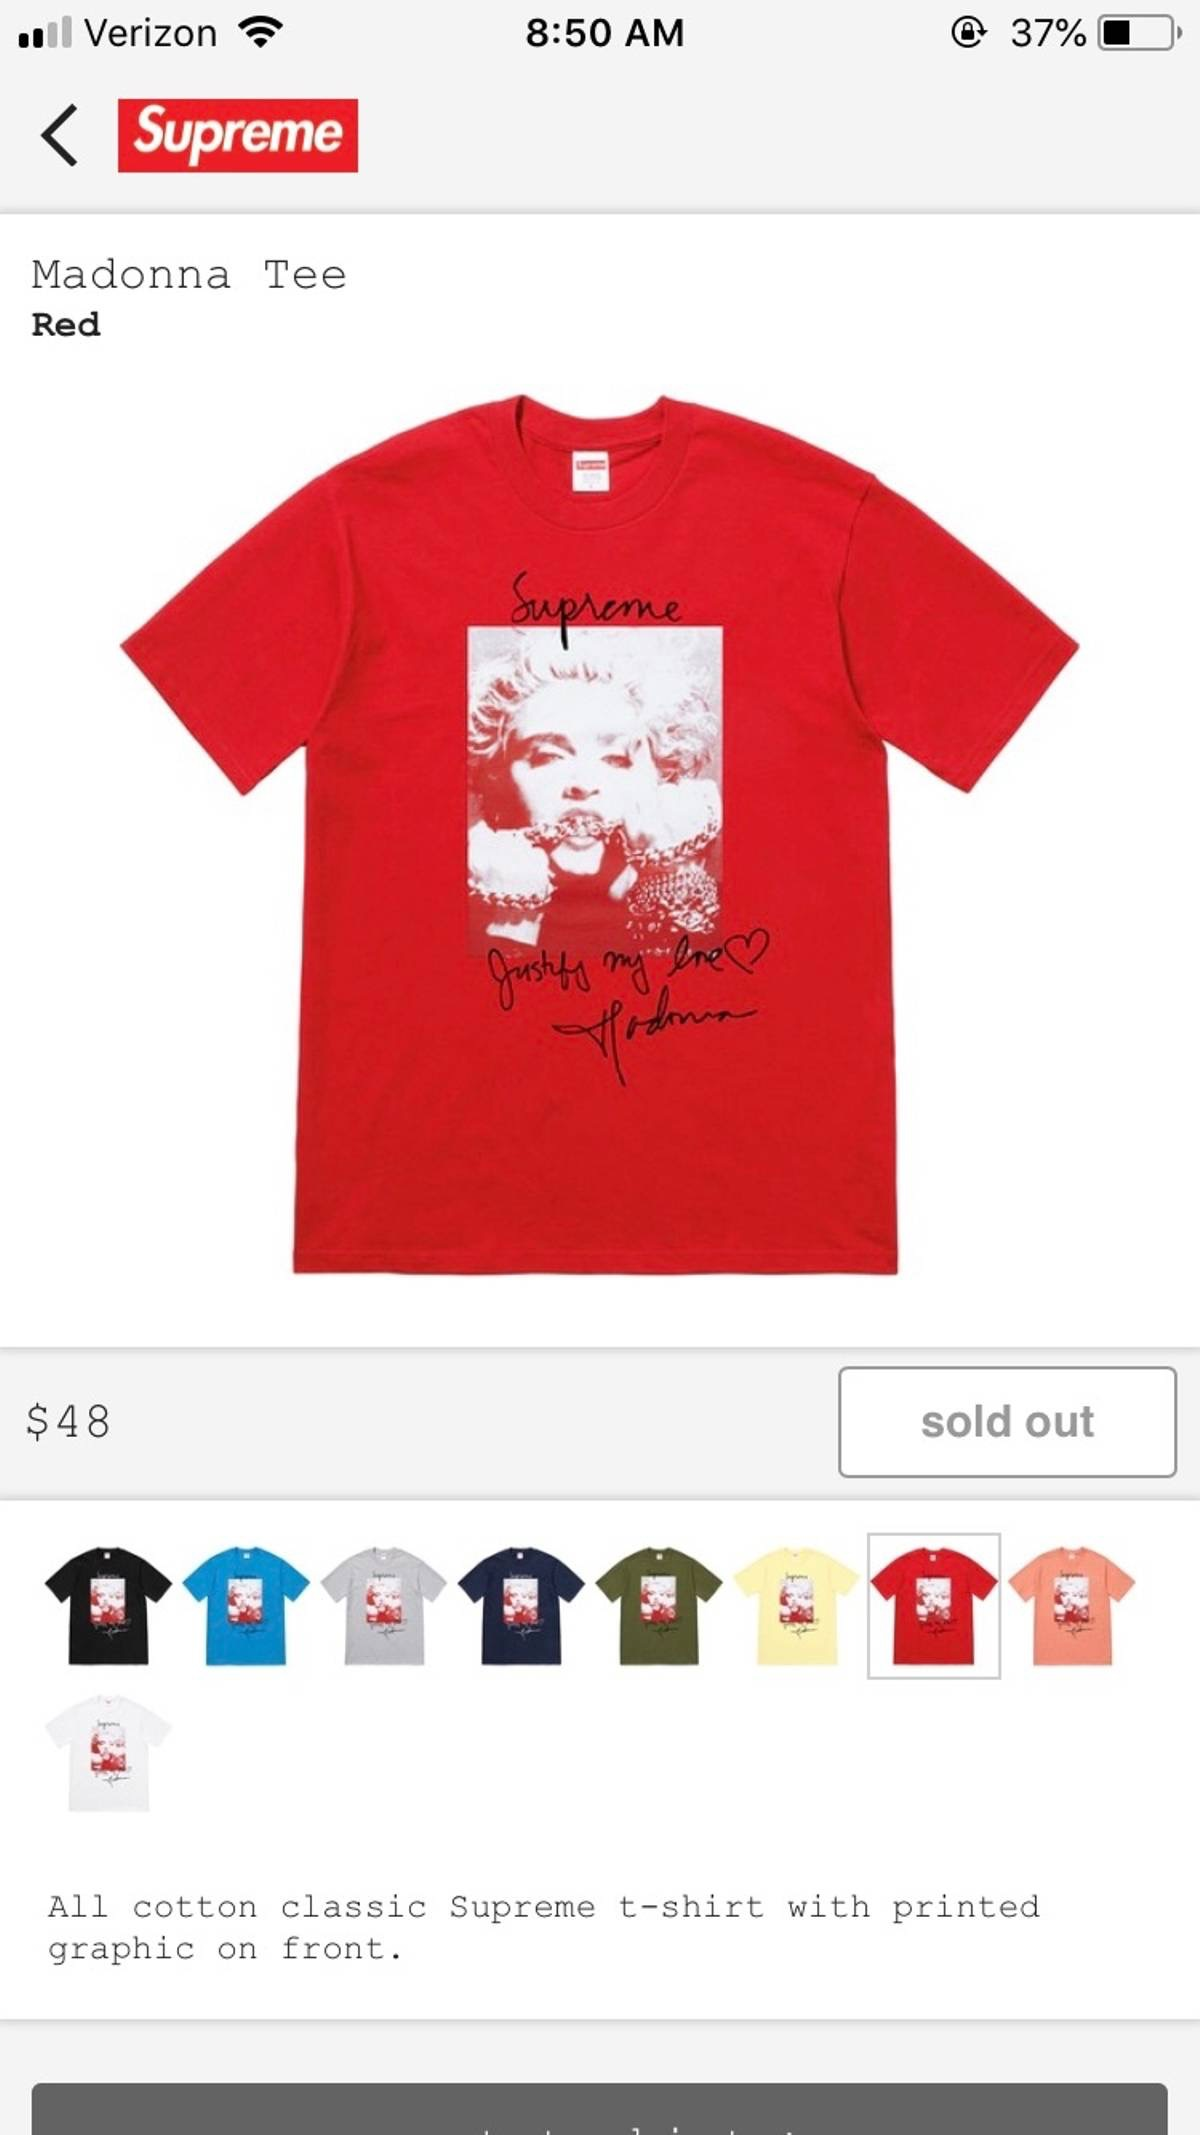 a2693dd8d Supreme 🔥supreme X Madonna Fw18 Photo Tee Size Medium (deadstock) Nwt 🔥  (not), Bape, Vintage, Gucci, Louis Vuitton, Chanel, Yeezys, Off White,  Nike, ...